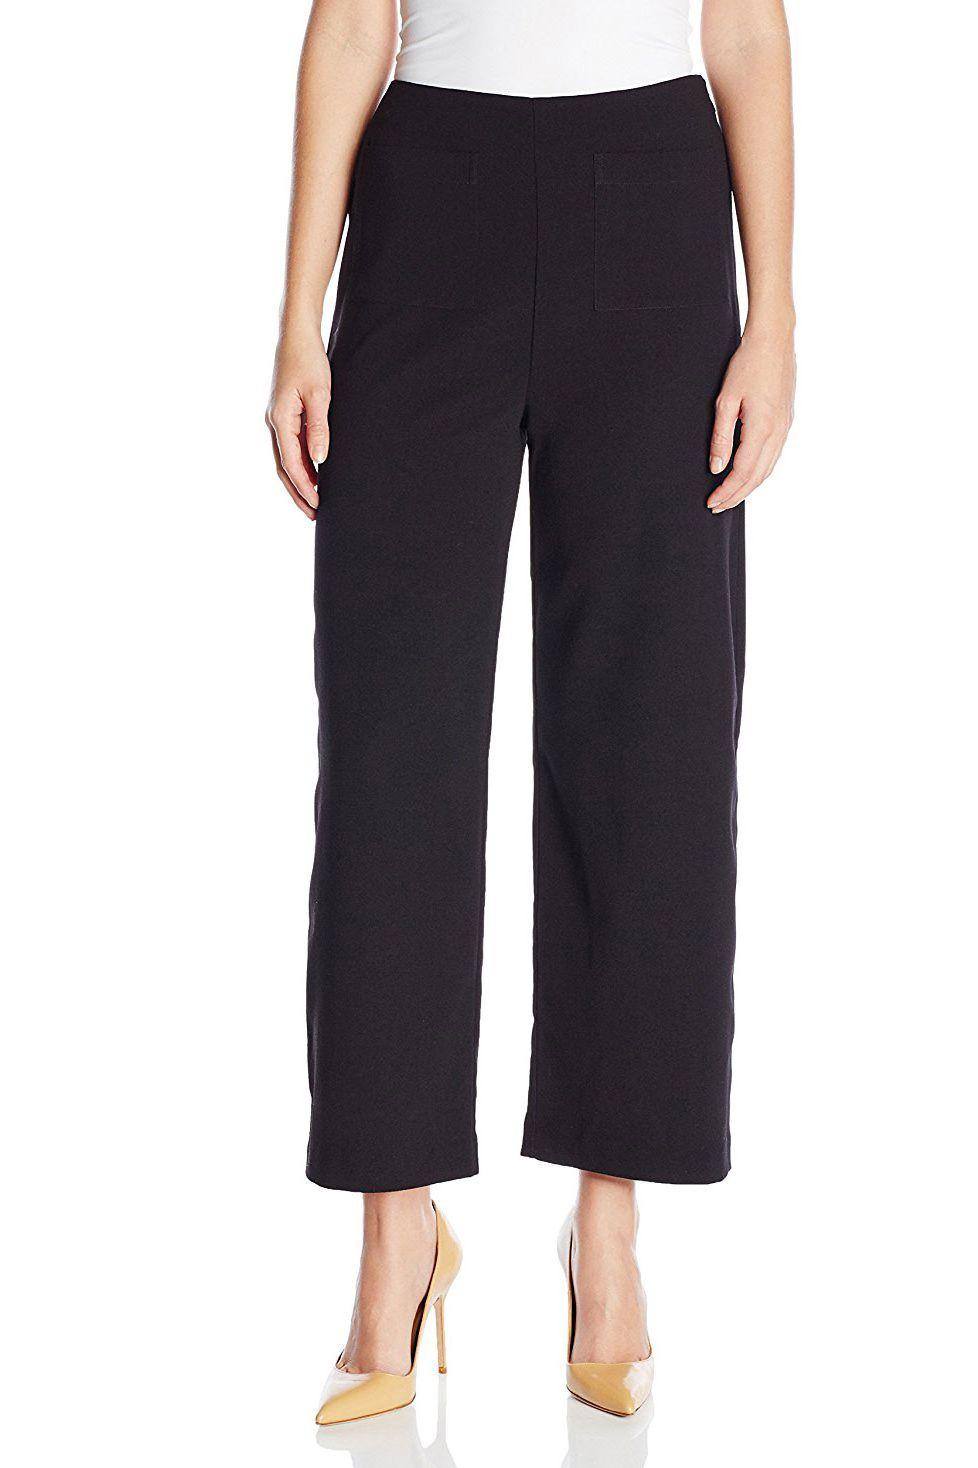 Lark & Ro Women's Patch Pocket Pant